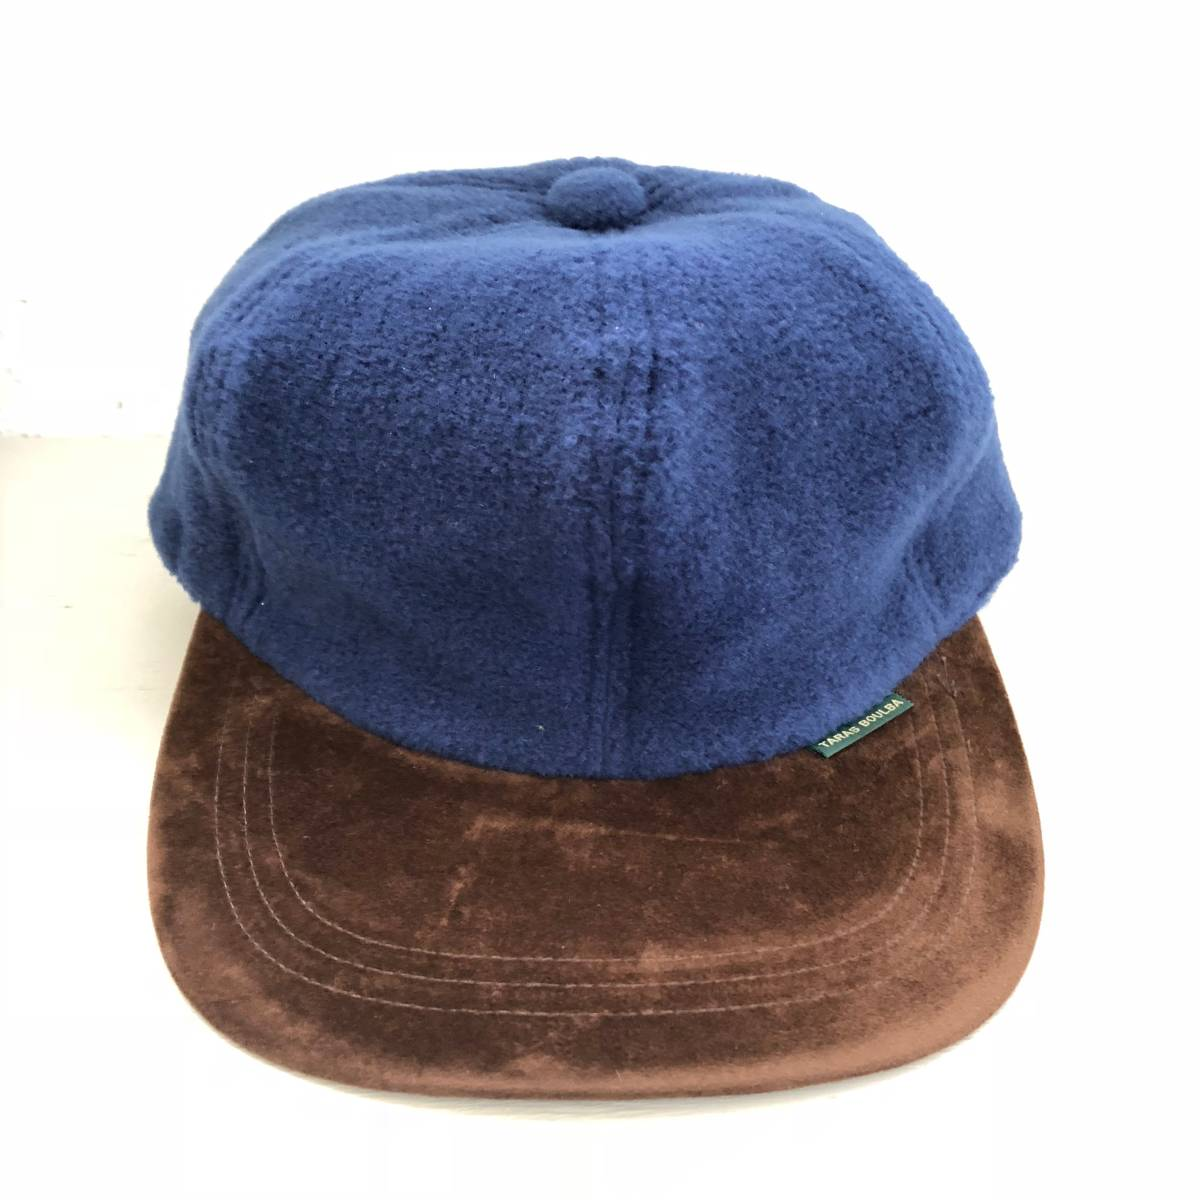 TARAS BOULBA タラスブルバ 帽子 キャップ フリースカントリーキャップ ネイビー 青系 L メンズ アシックス asics UFH350 日本製 未使用_画像1